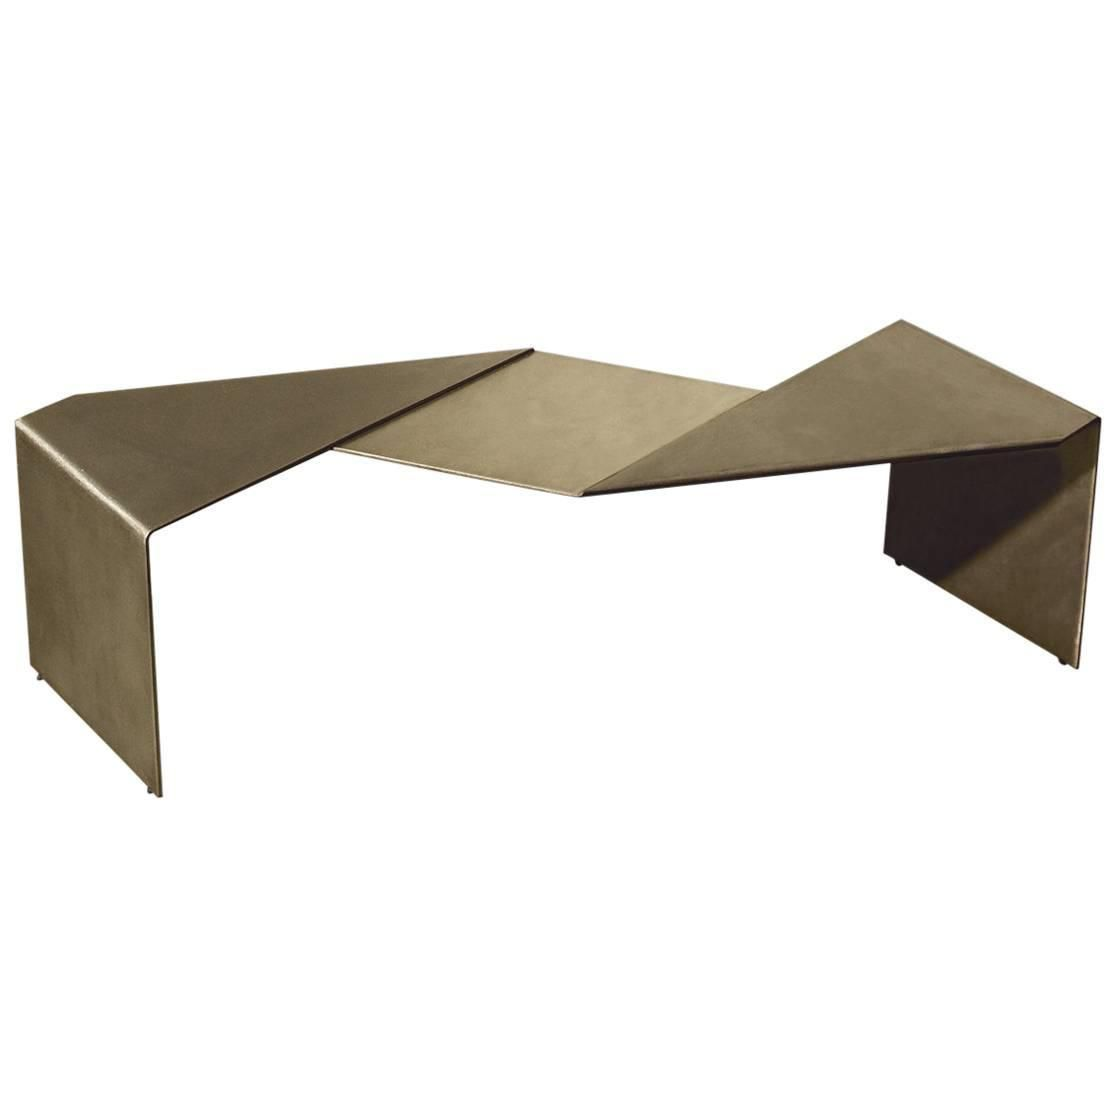 Fold bench by uhuru design antique brass